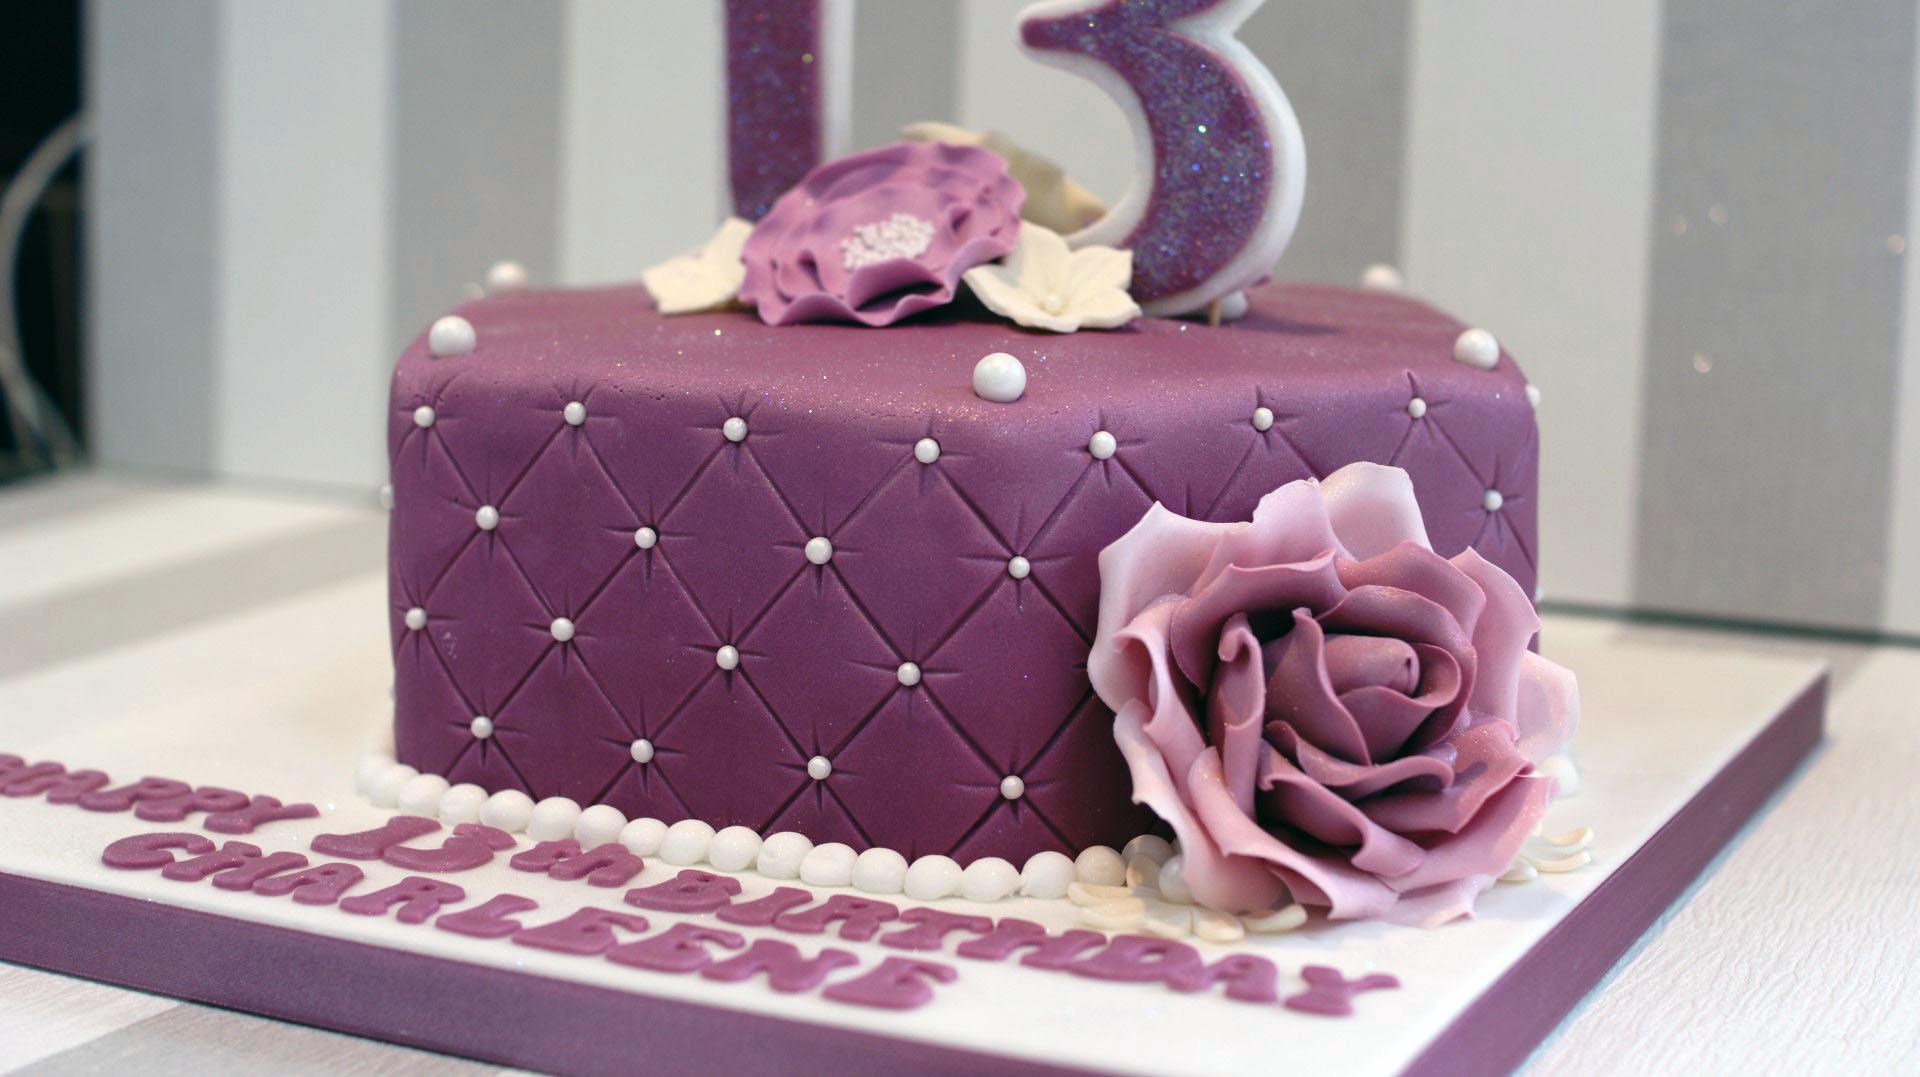 Superb 9 Pretty Bday Cakes Photo Beautiful Birthday Cake Pretty Funny Birthday Cards Online Fluifree Goldxyz